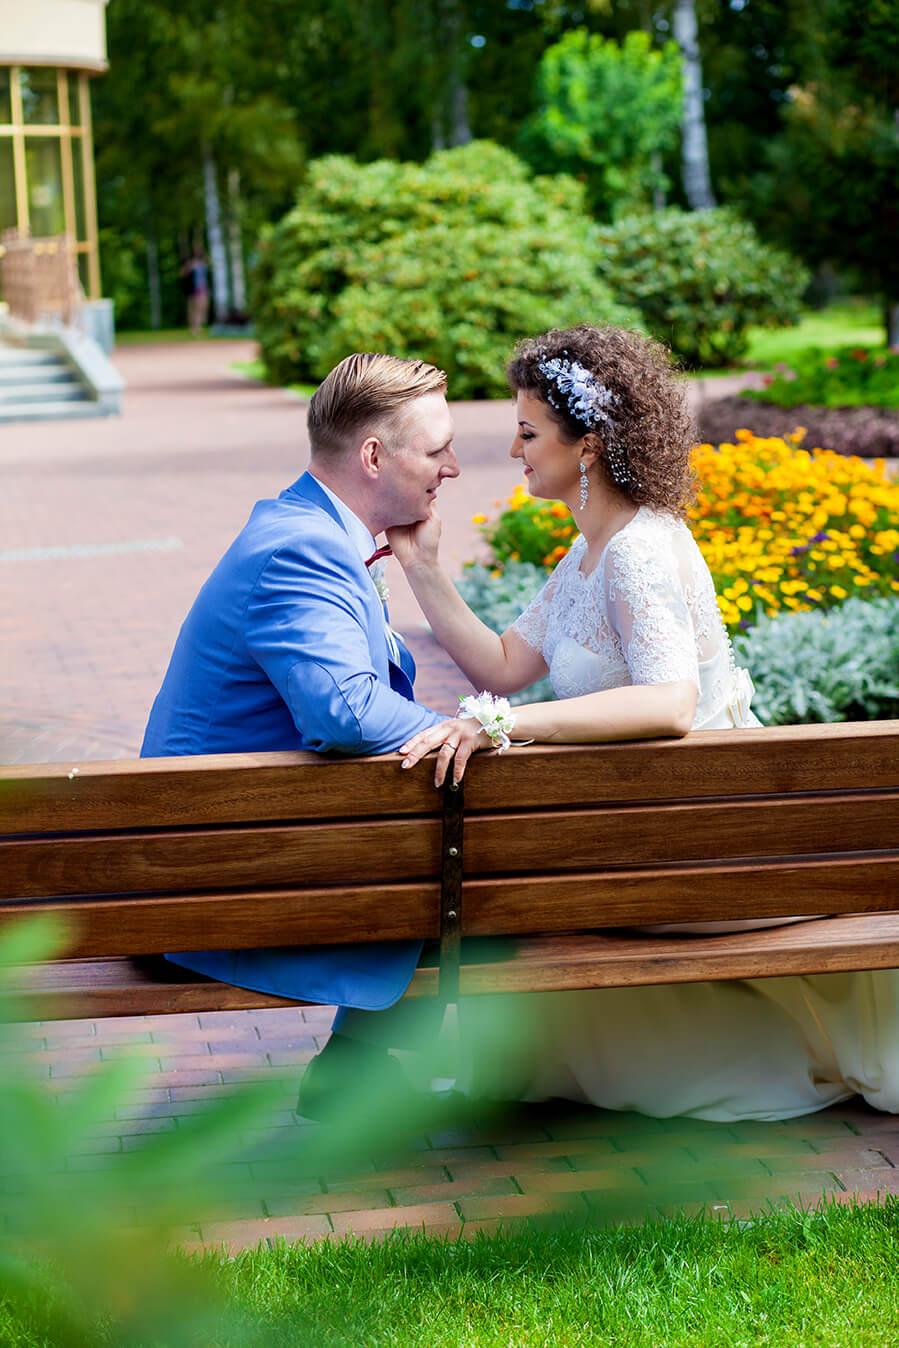 3-svadebnyj-fotograf-videooperator-svadebnoe-foto-idei-kiev-18